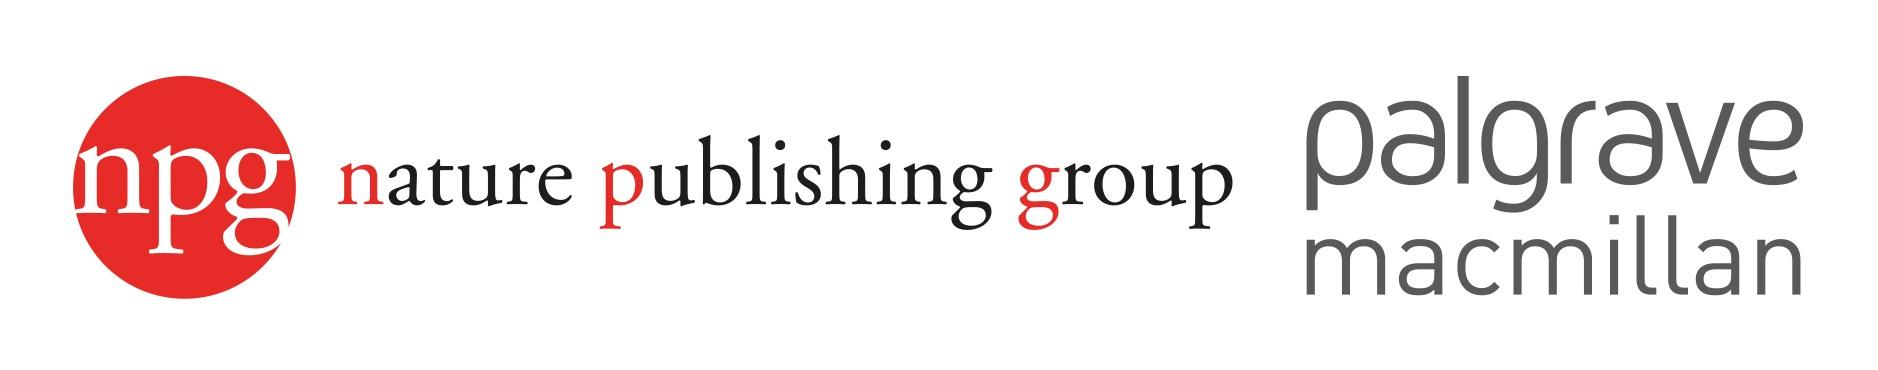 npg Nature Publishing Group Palgrave Macmillan logo